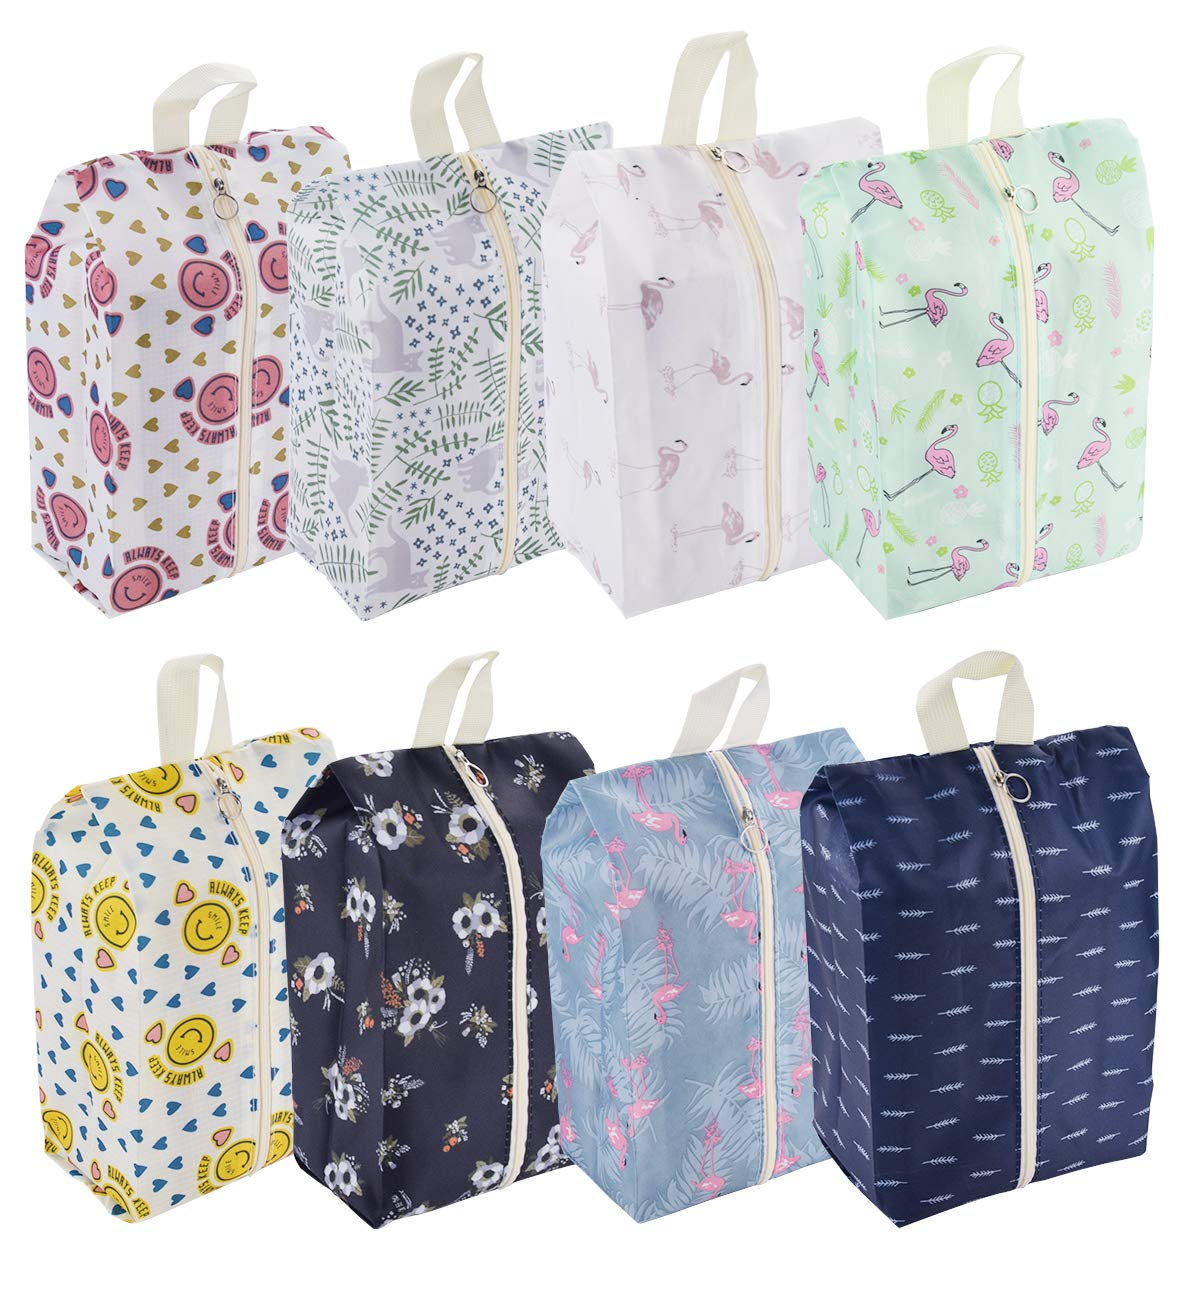 Travel Shoe Bags Waterproof Portable Shoe Storage Pouch with Handle for Men & Women (8 Pack Cute Pattern) by PIXHOTUL